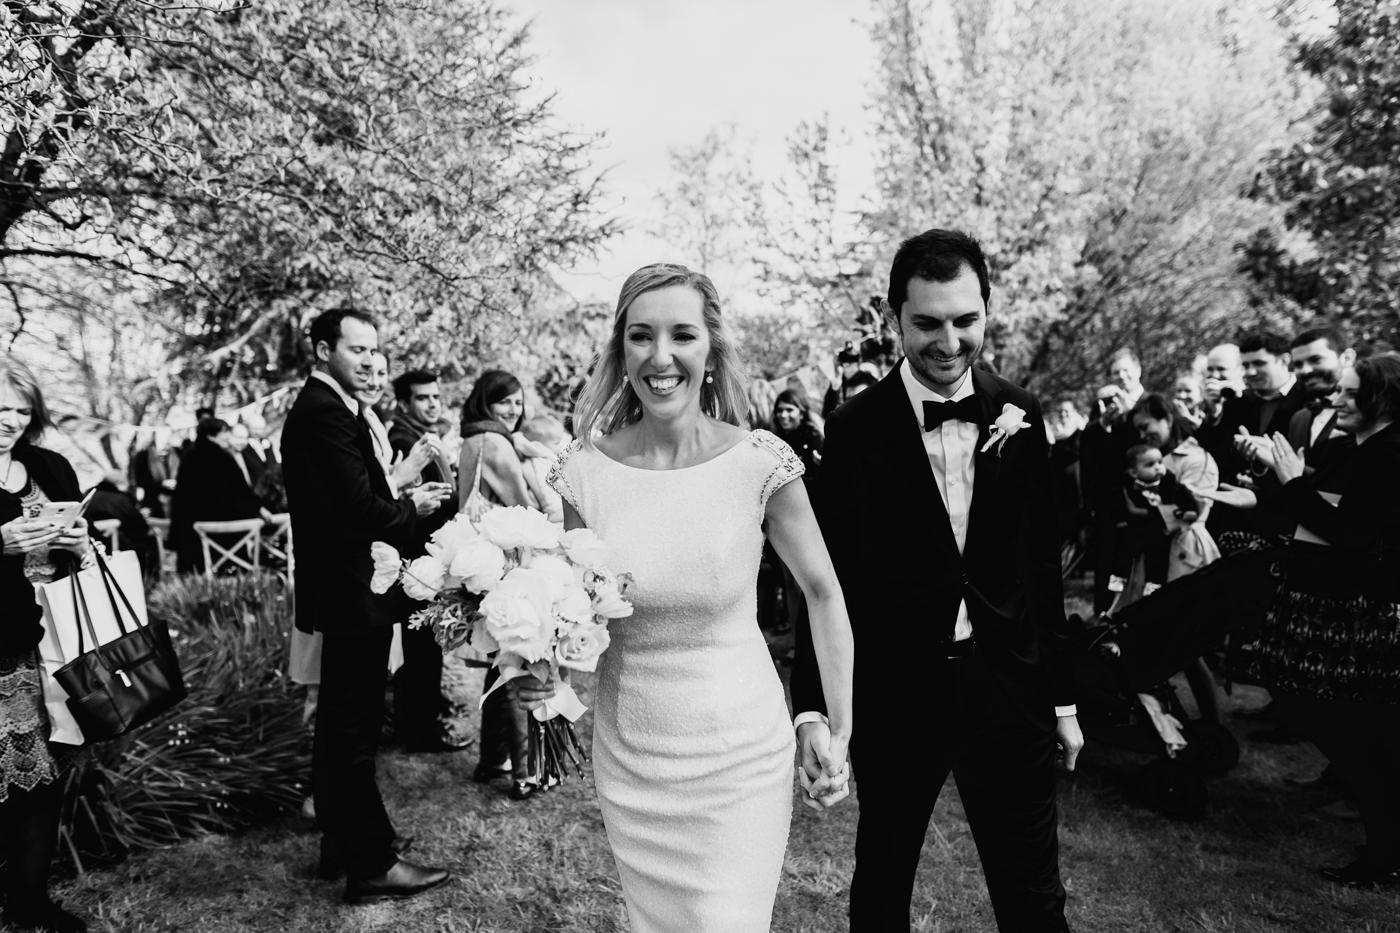 Bridget & James - Orange Country Wedding - Samantha Heather Photography-58.jpg